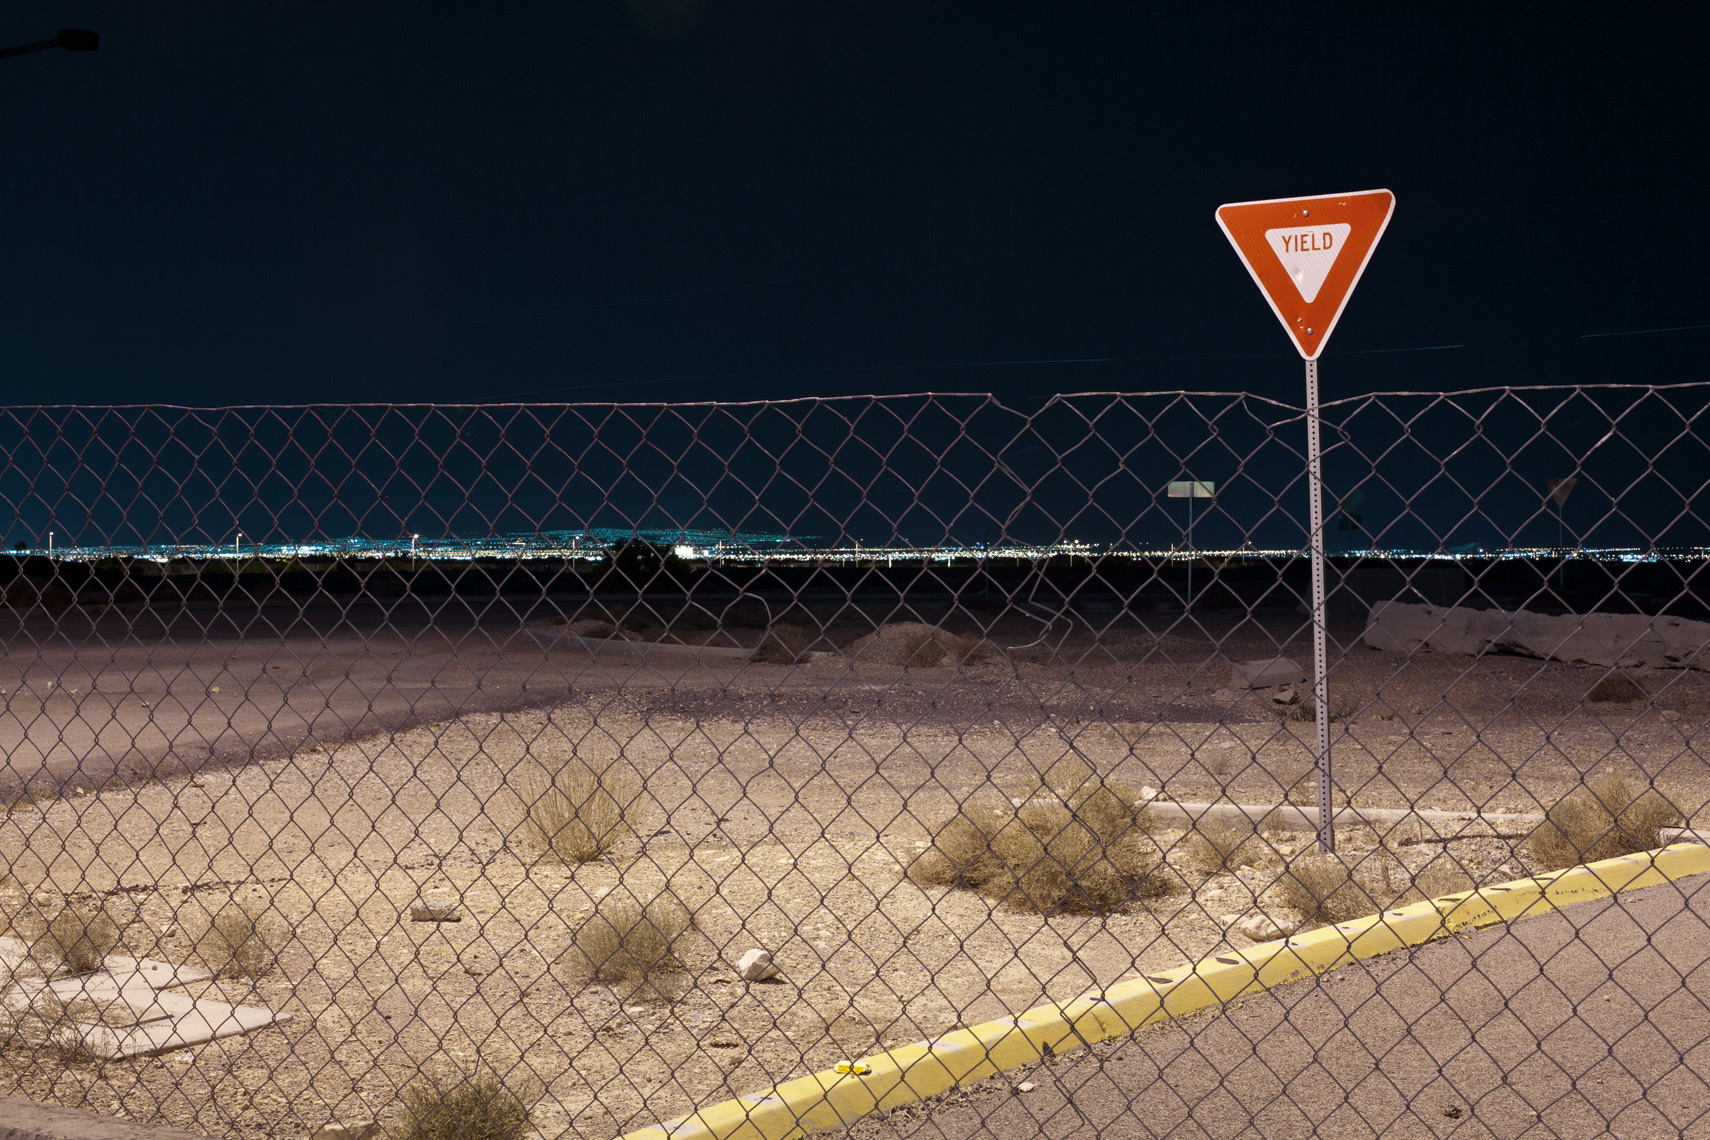 Vegasnight_MG_4877.jpg